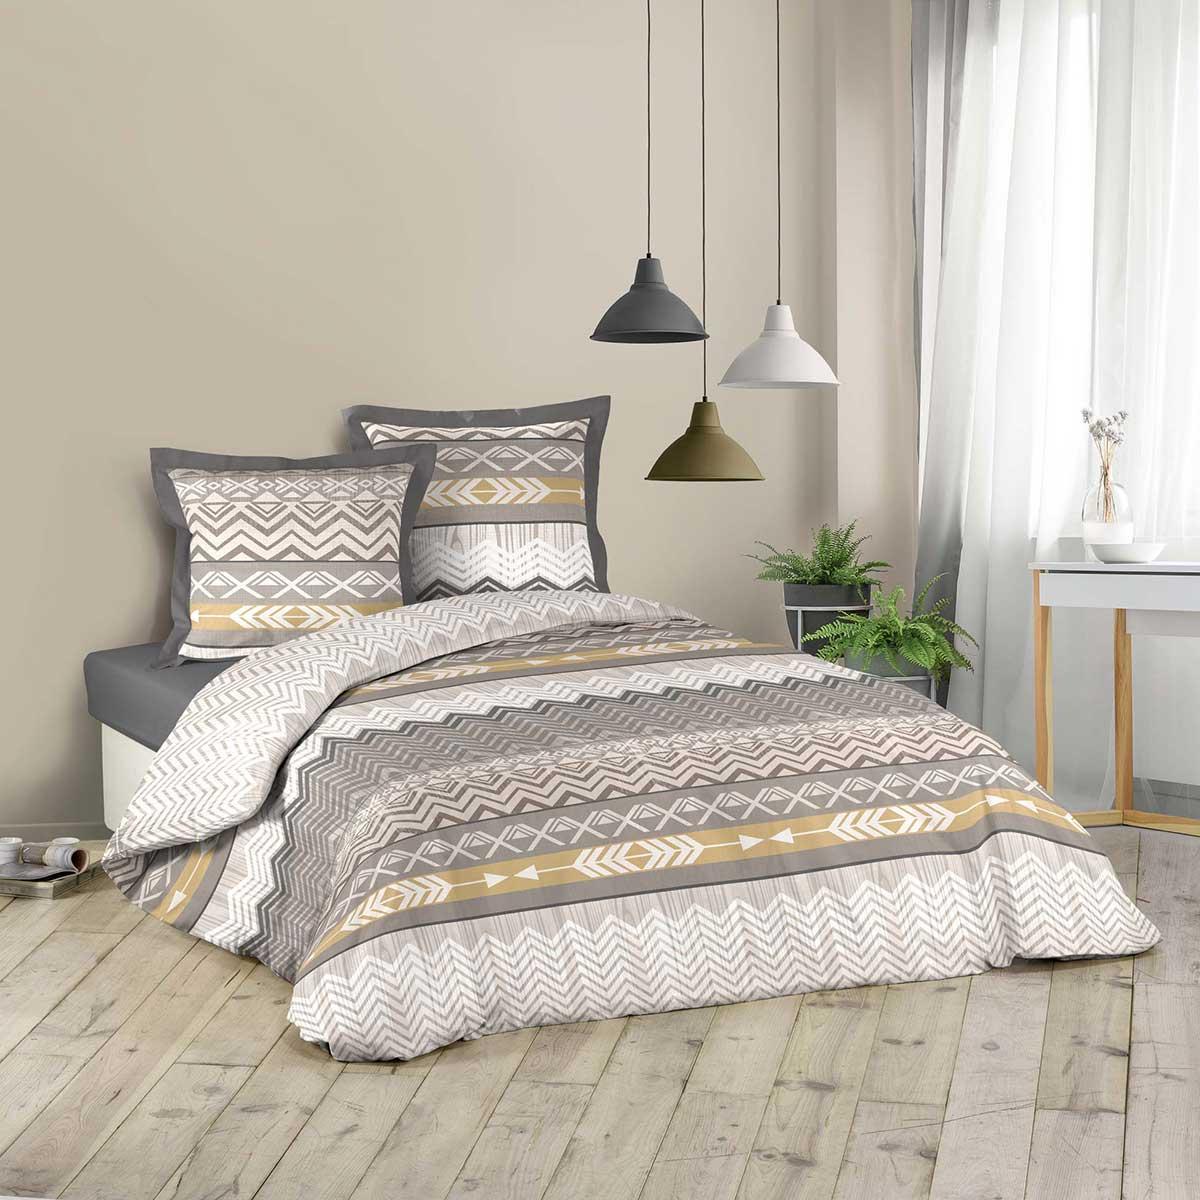 parure de couette imprim e ethnique dor multicolore. Black Bedroom Furniture Sets. Home Design Ideas